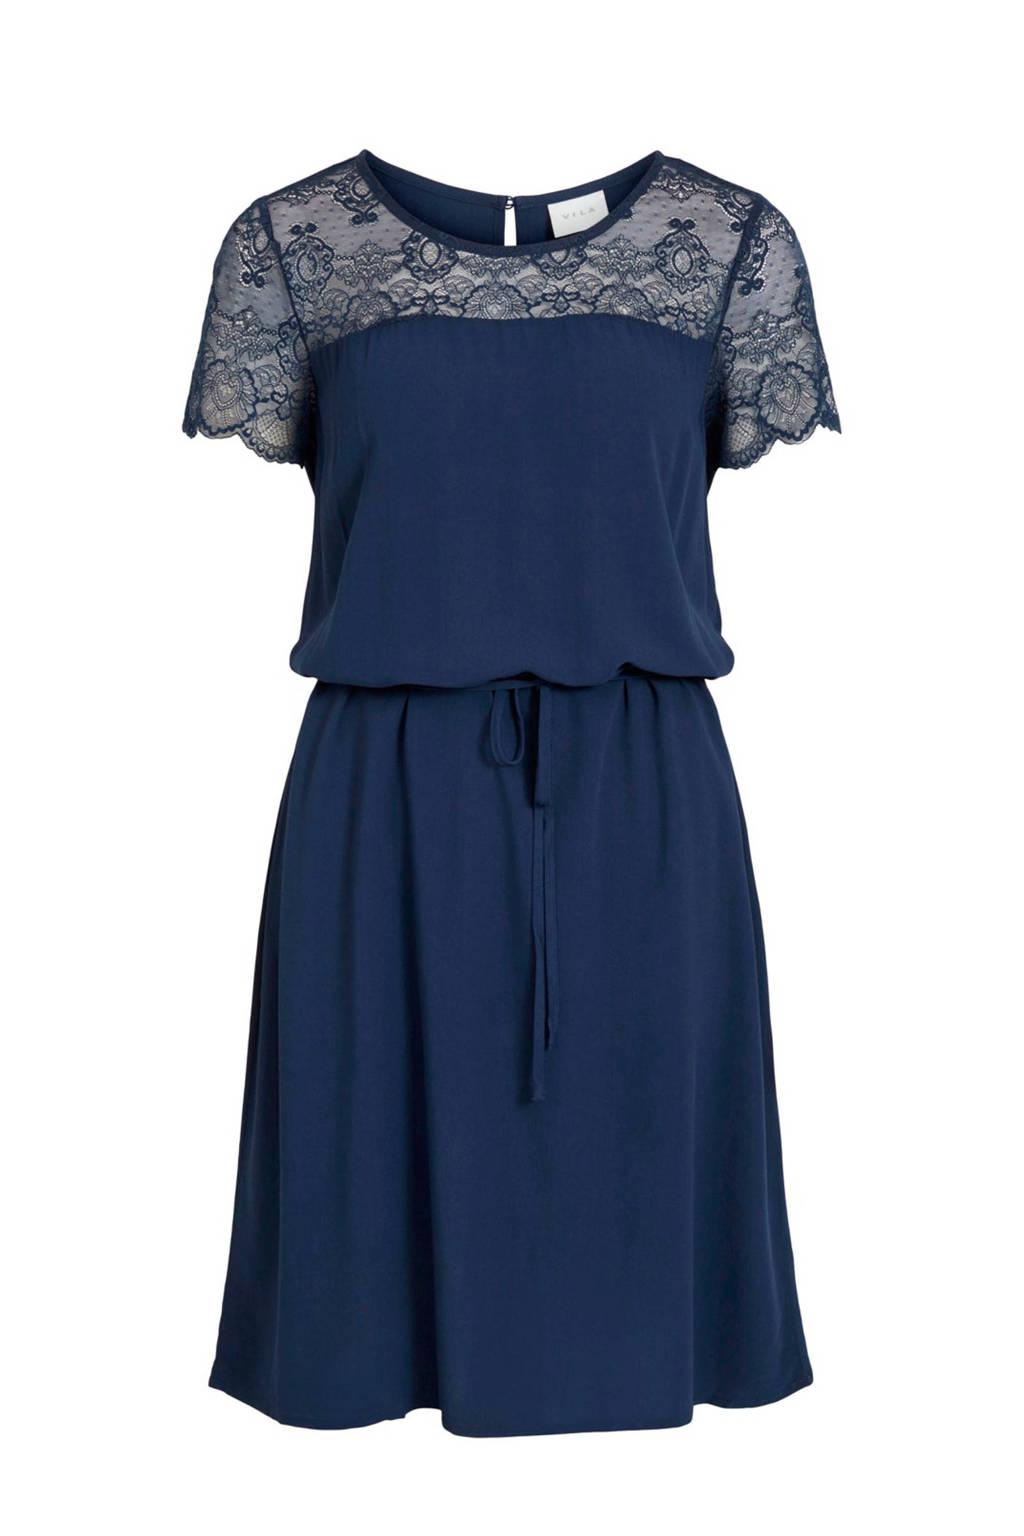 VILA jurk en kant donkerblauw, Donkerblauw